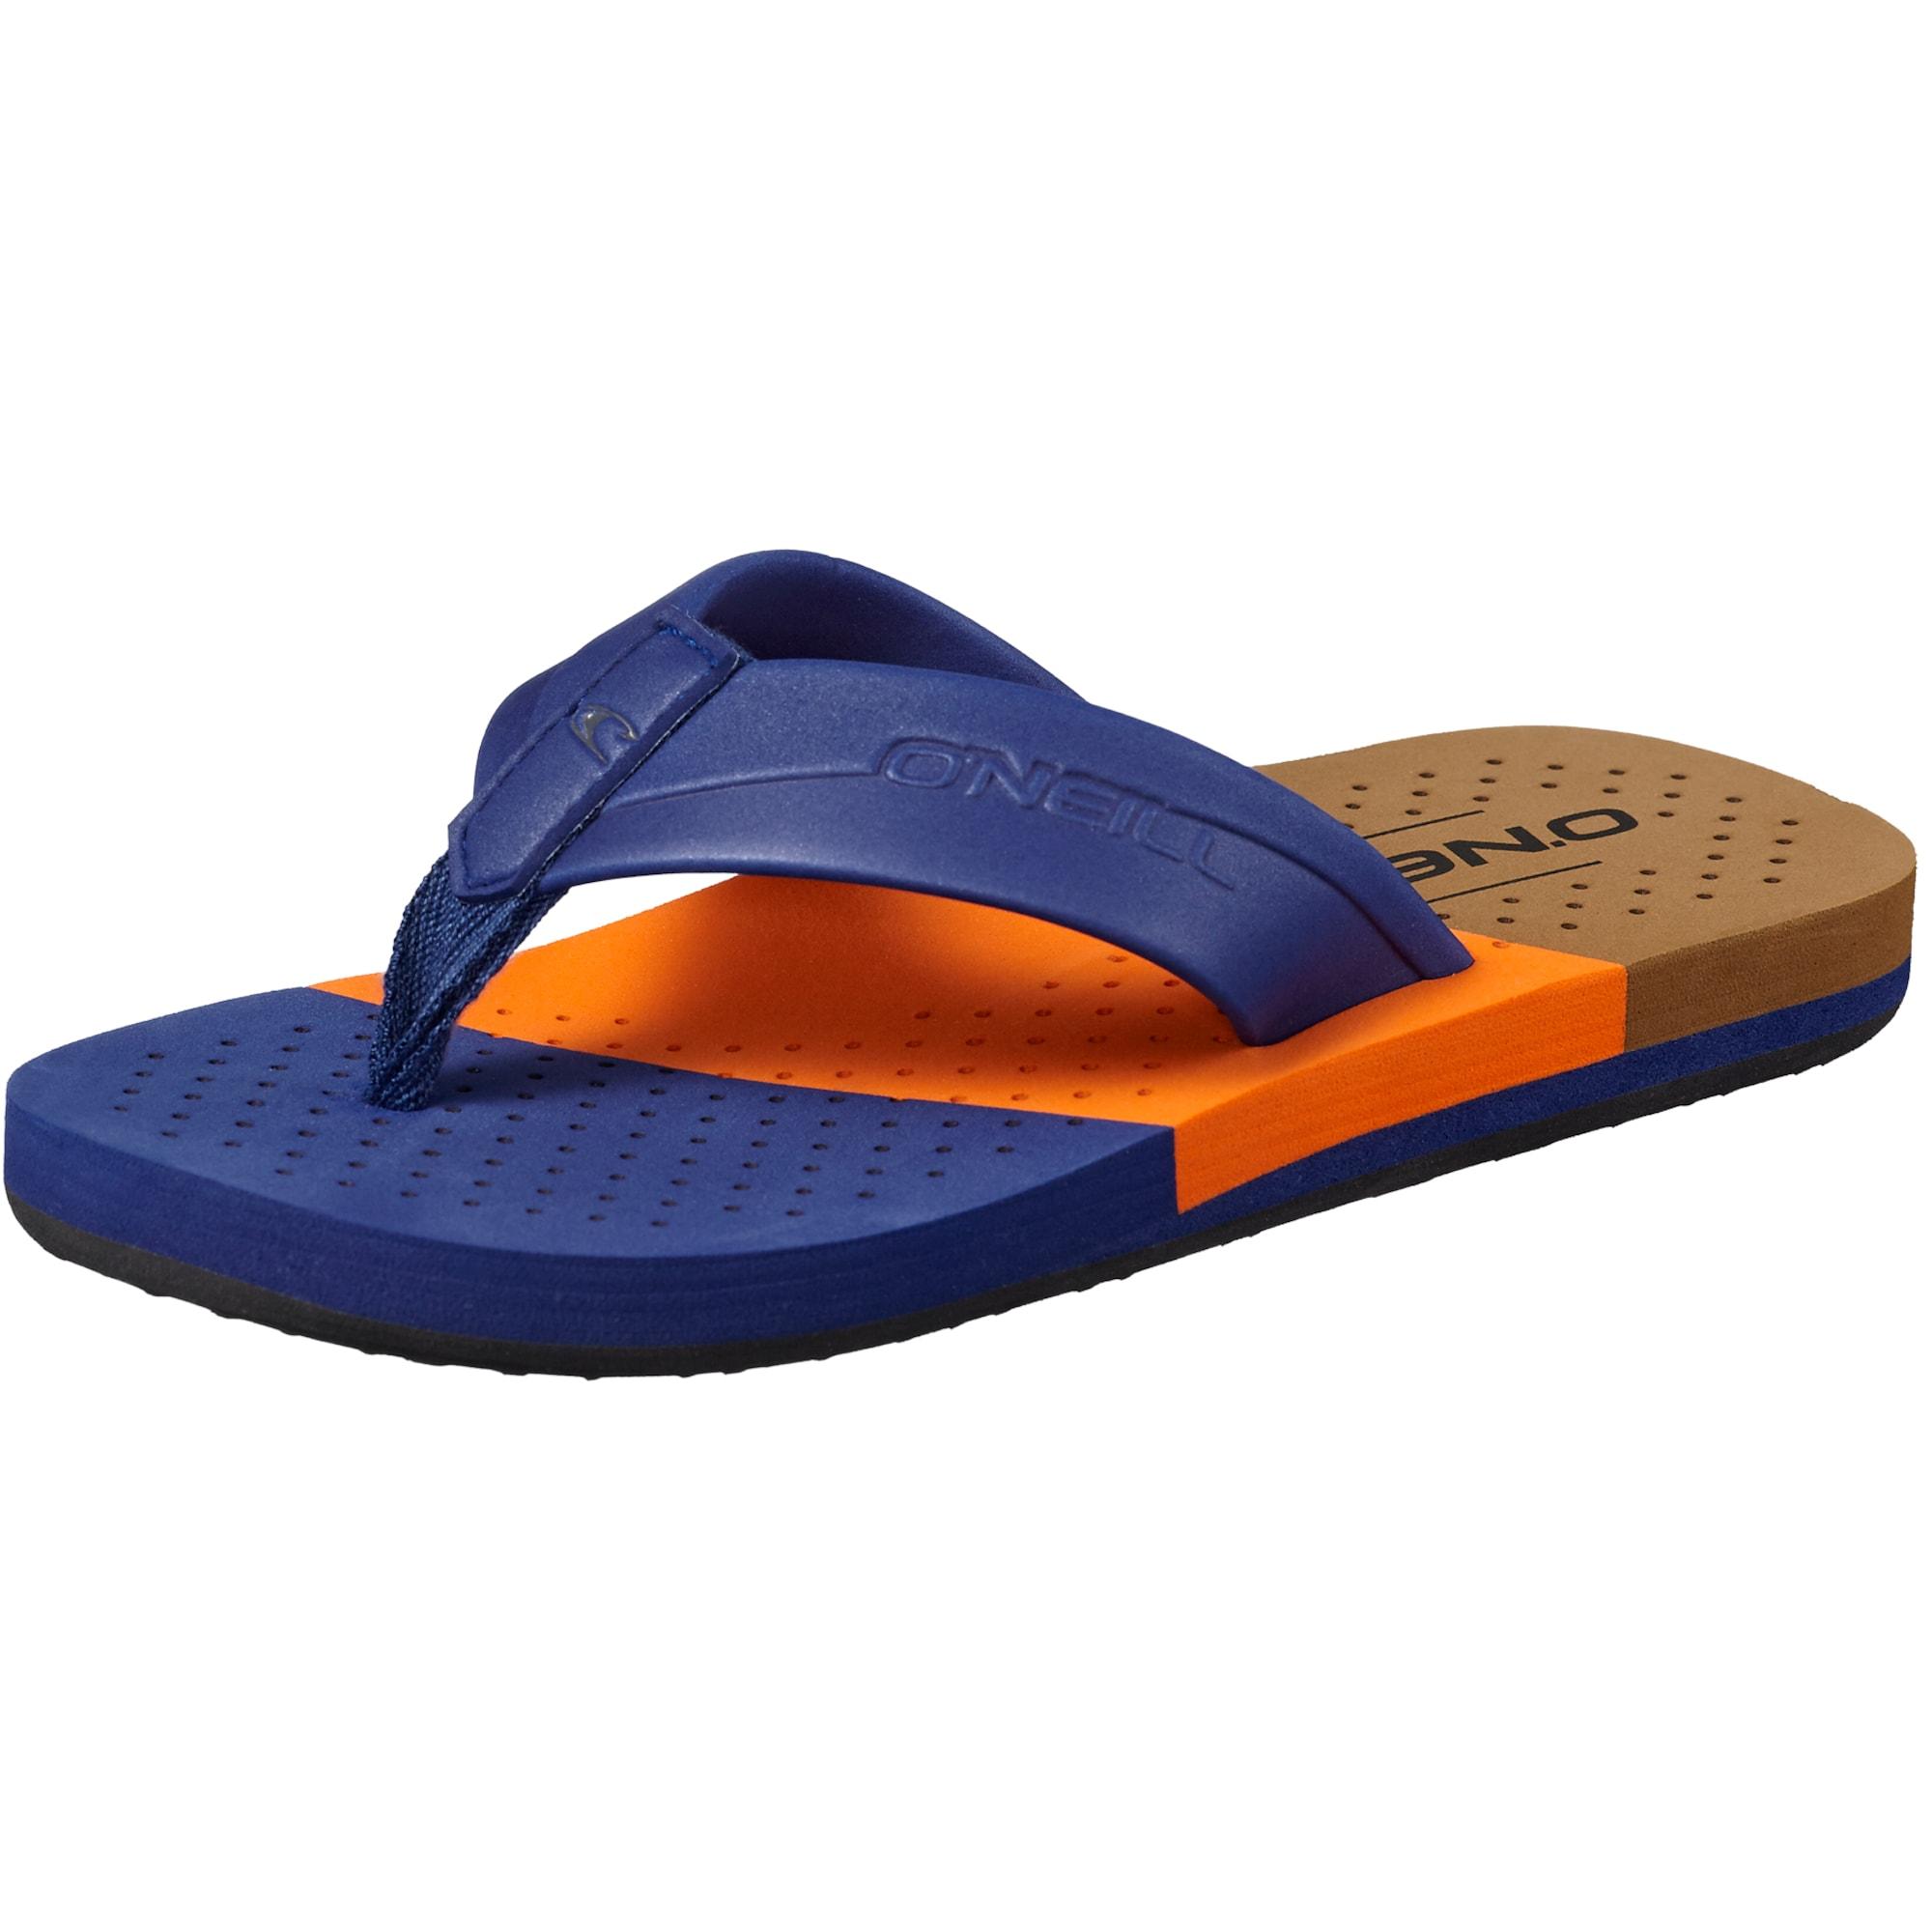 Schuhe ´FB CALI BLOCK FLIP FLOPS´